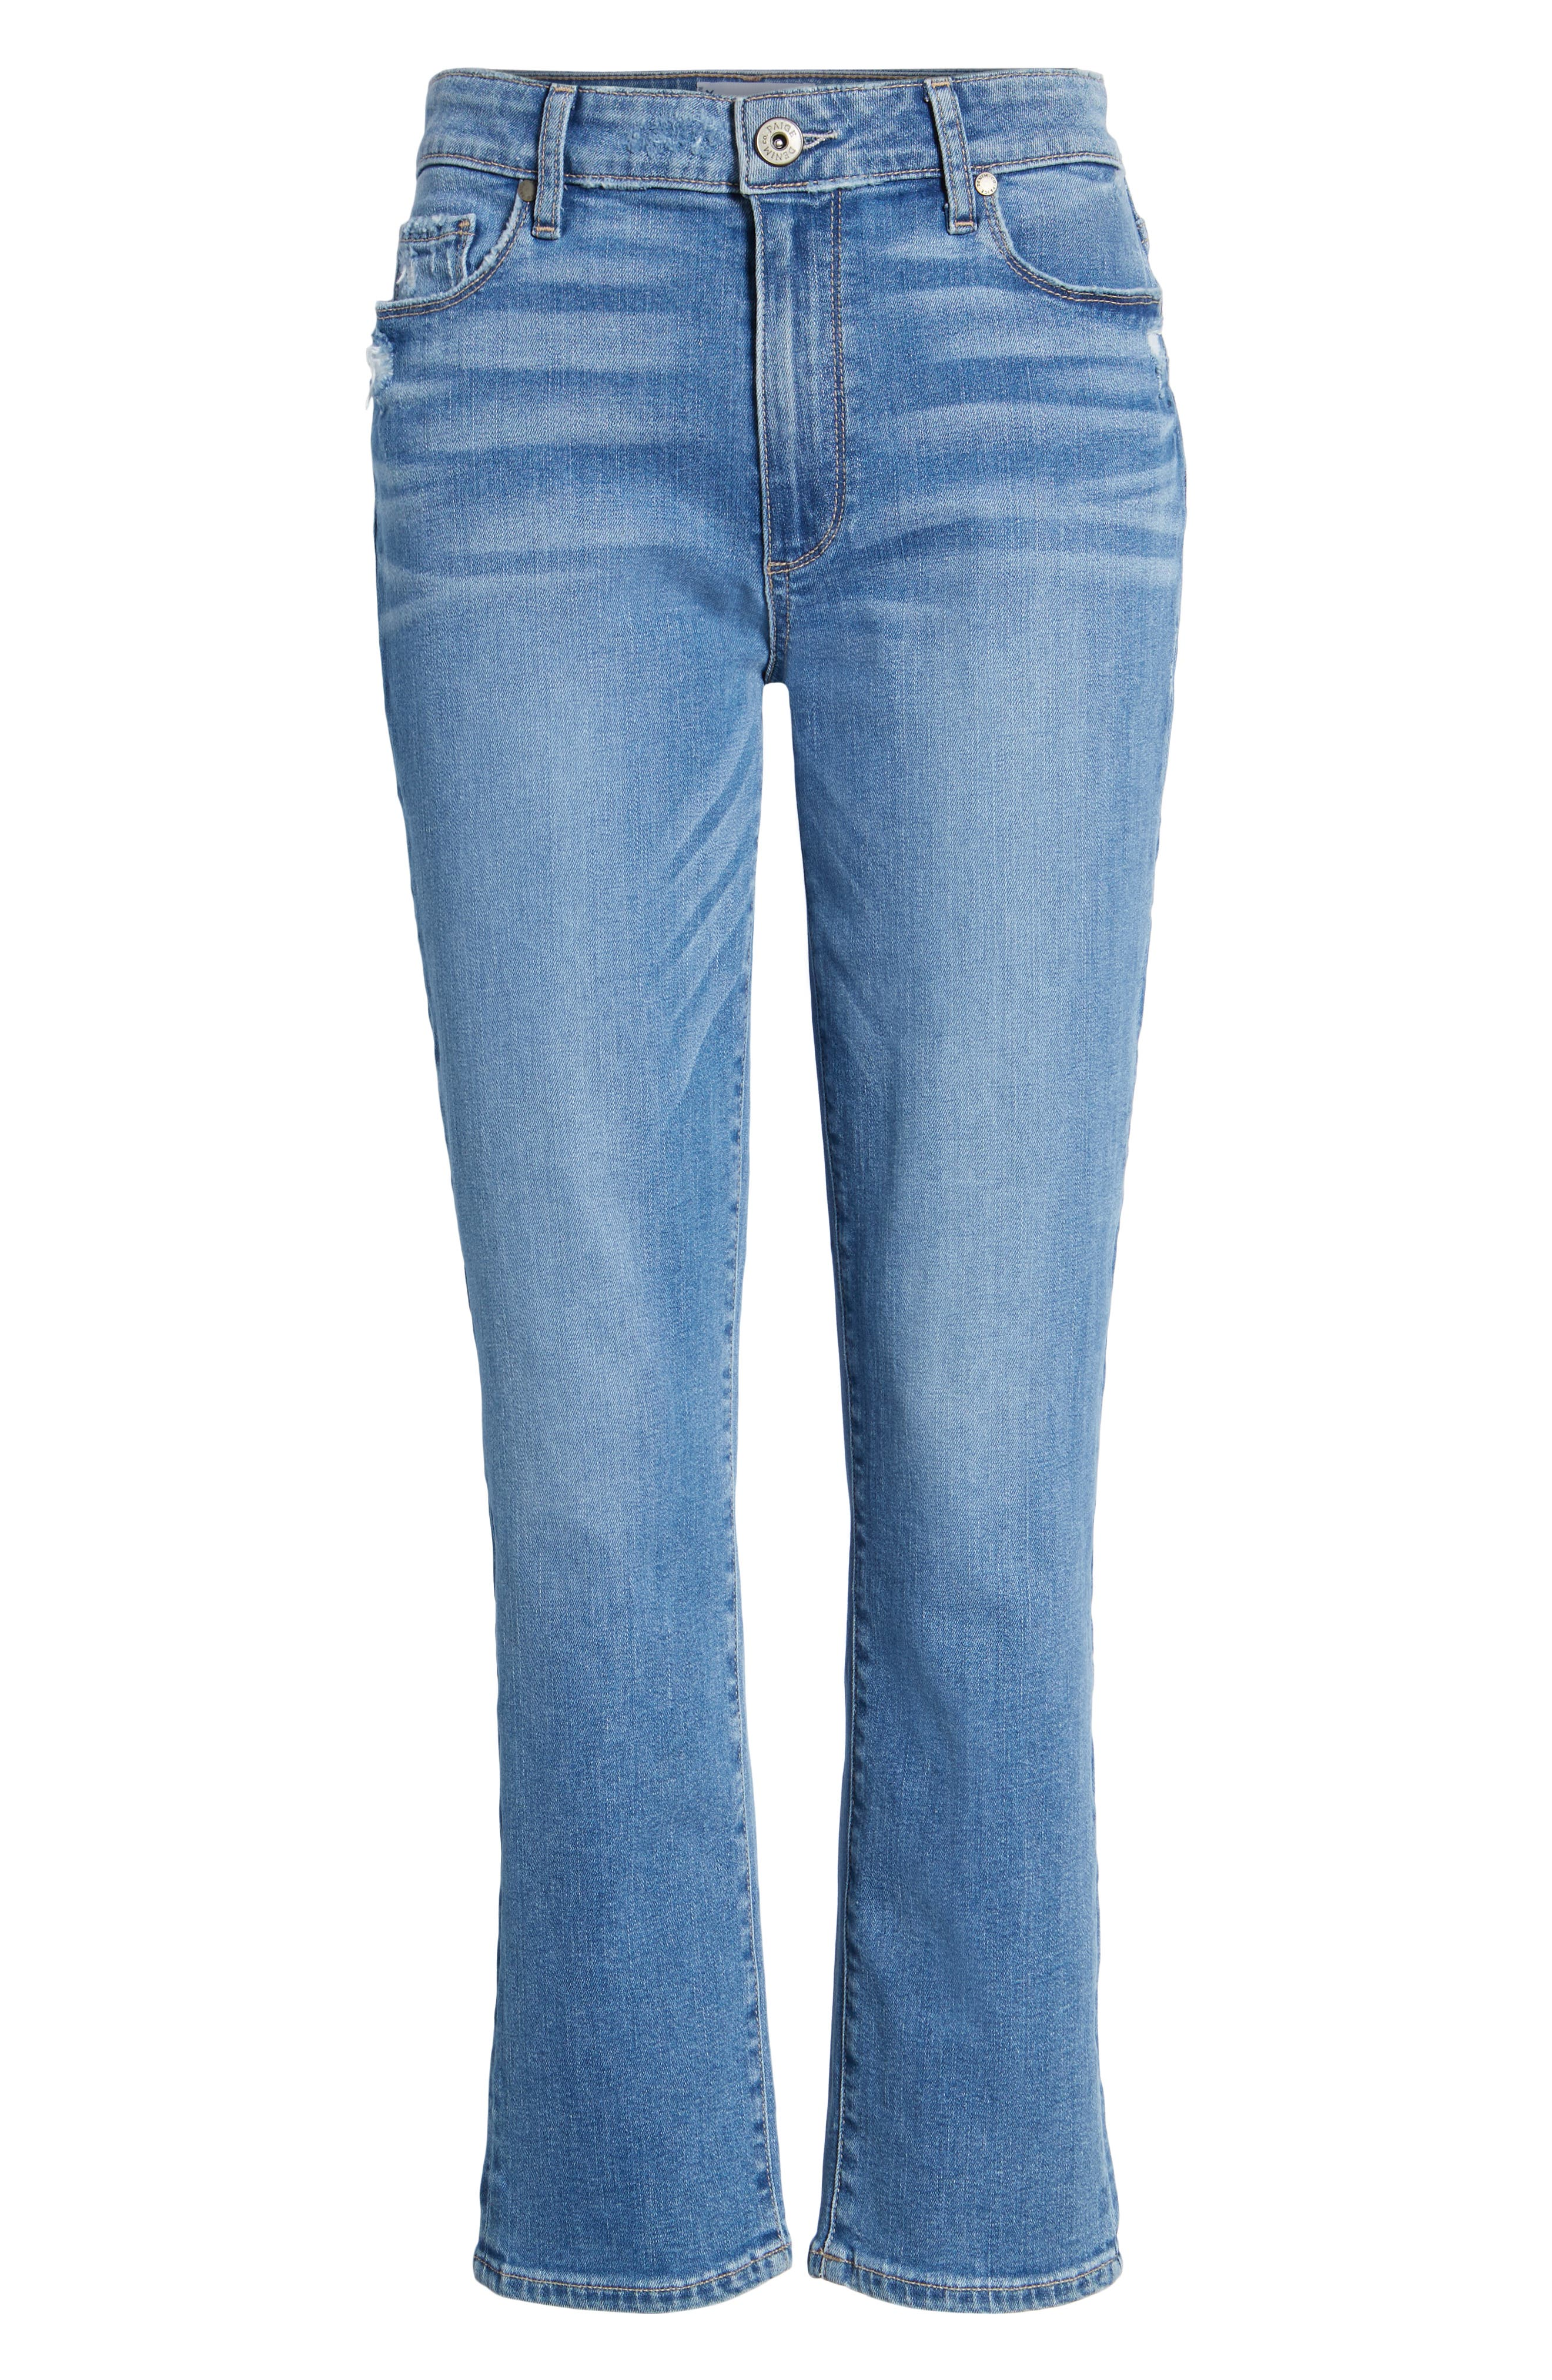 Transcend Vintage - Jimmy Jimmy High Waist Crop Boyfriend Jeans,                             Alternate thumbnail 7, color,                             Vintage Venice